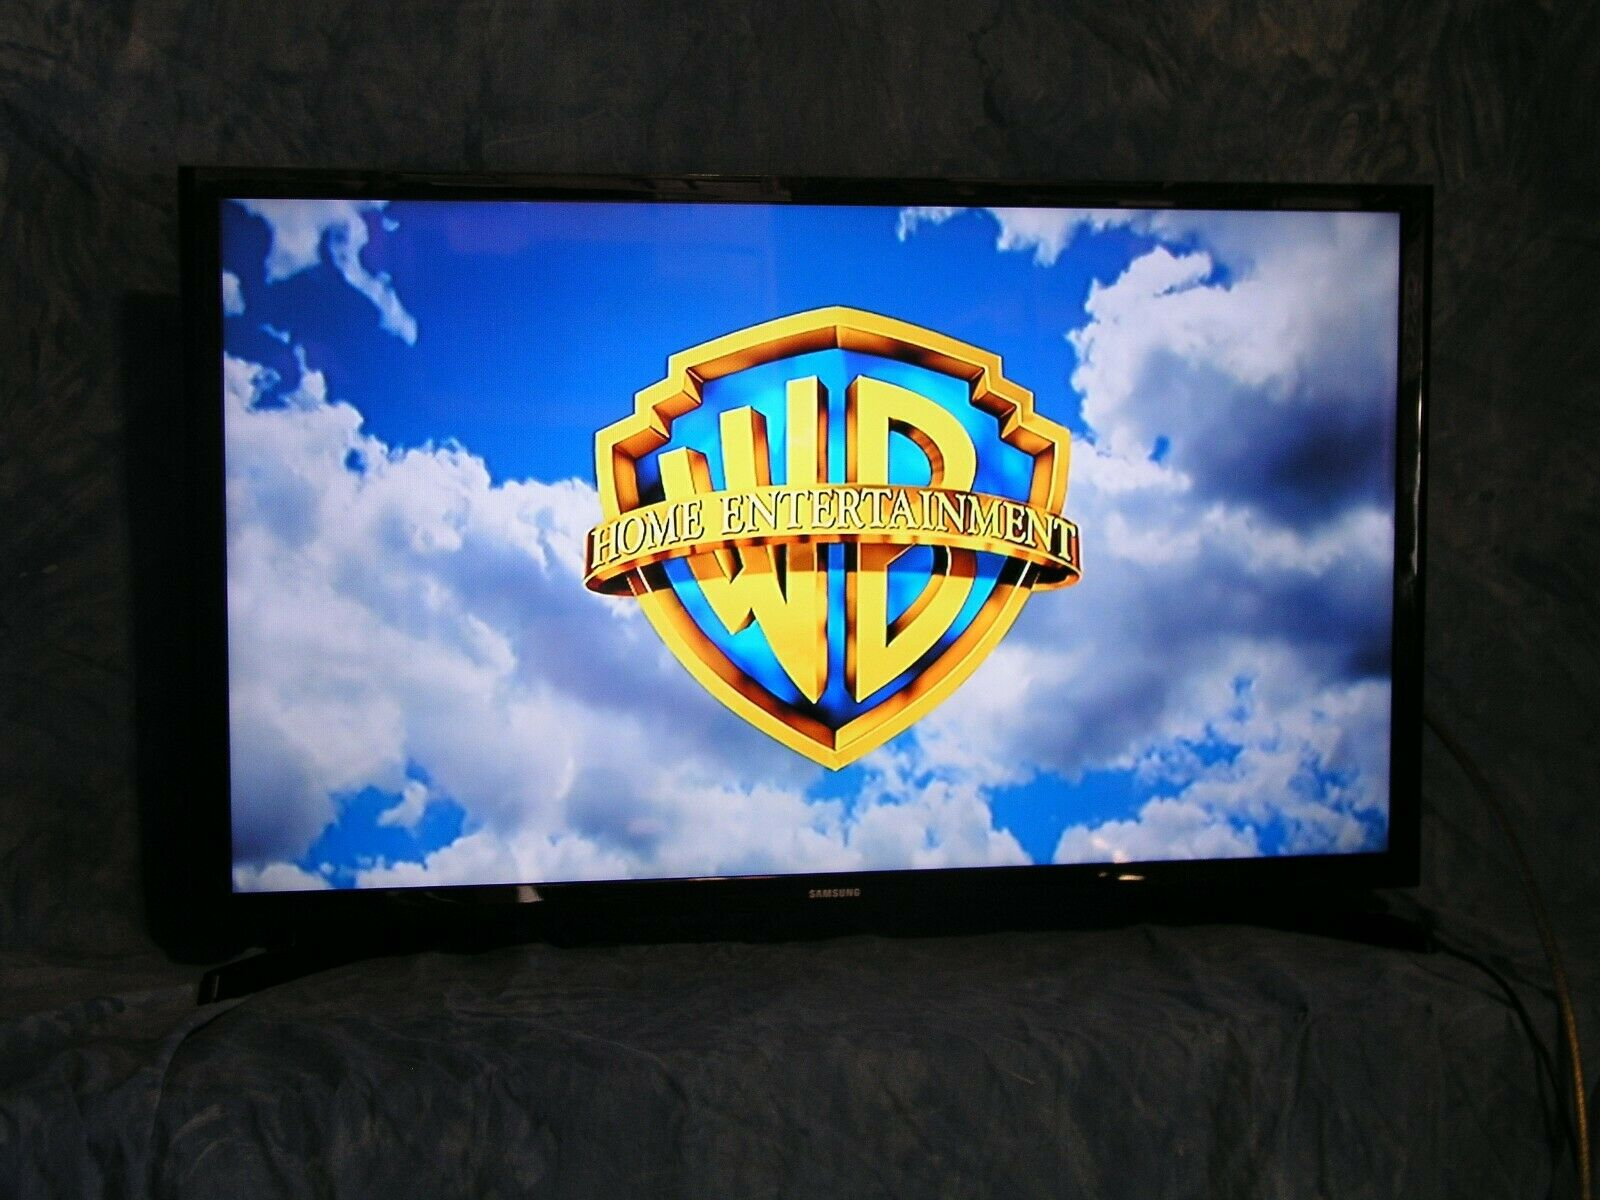 Samsung 32 Inch 720p Motion Rate 60 Slim LED HDTV  UN32J4000AFXZA (2015)